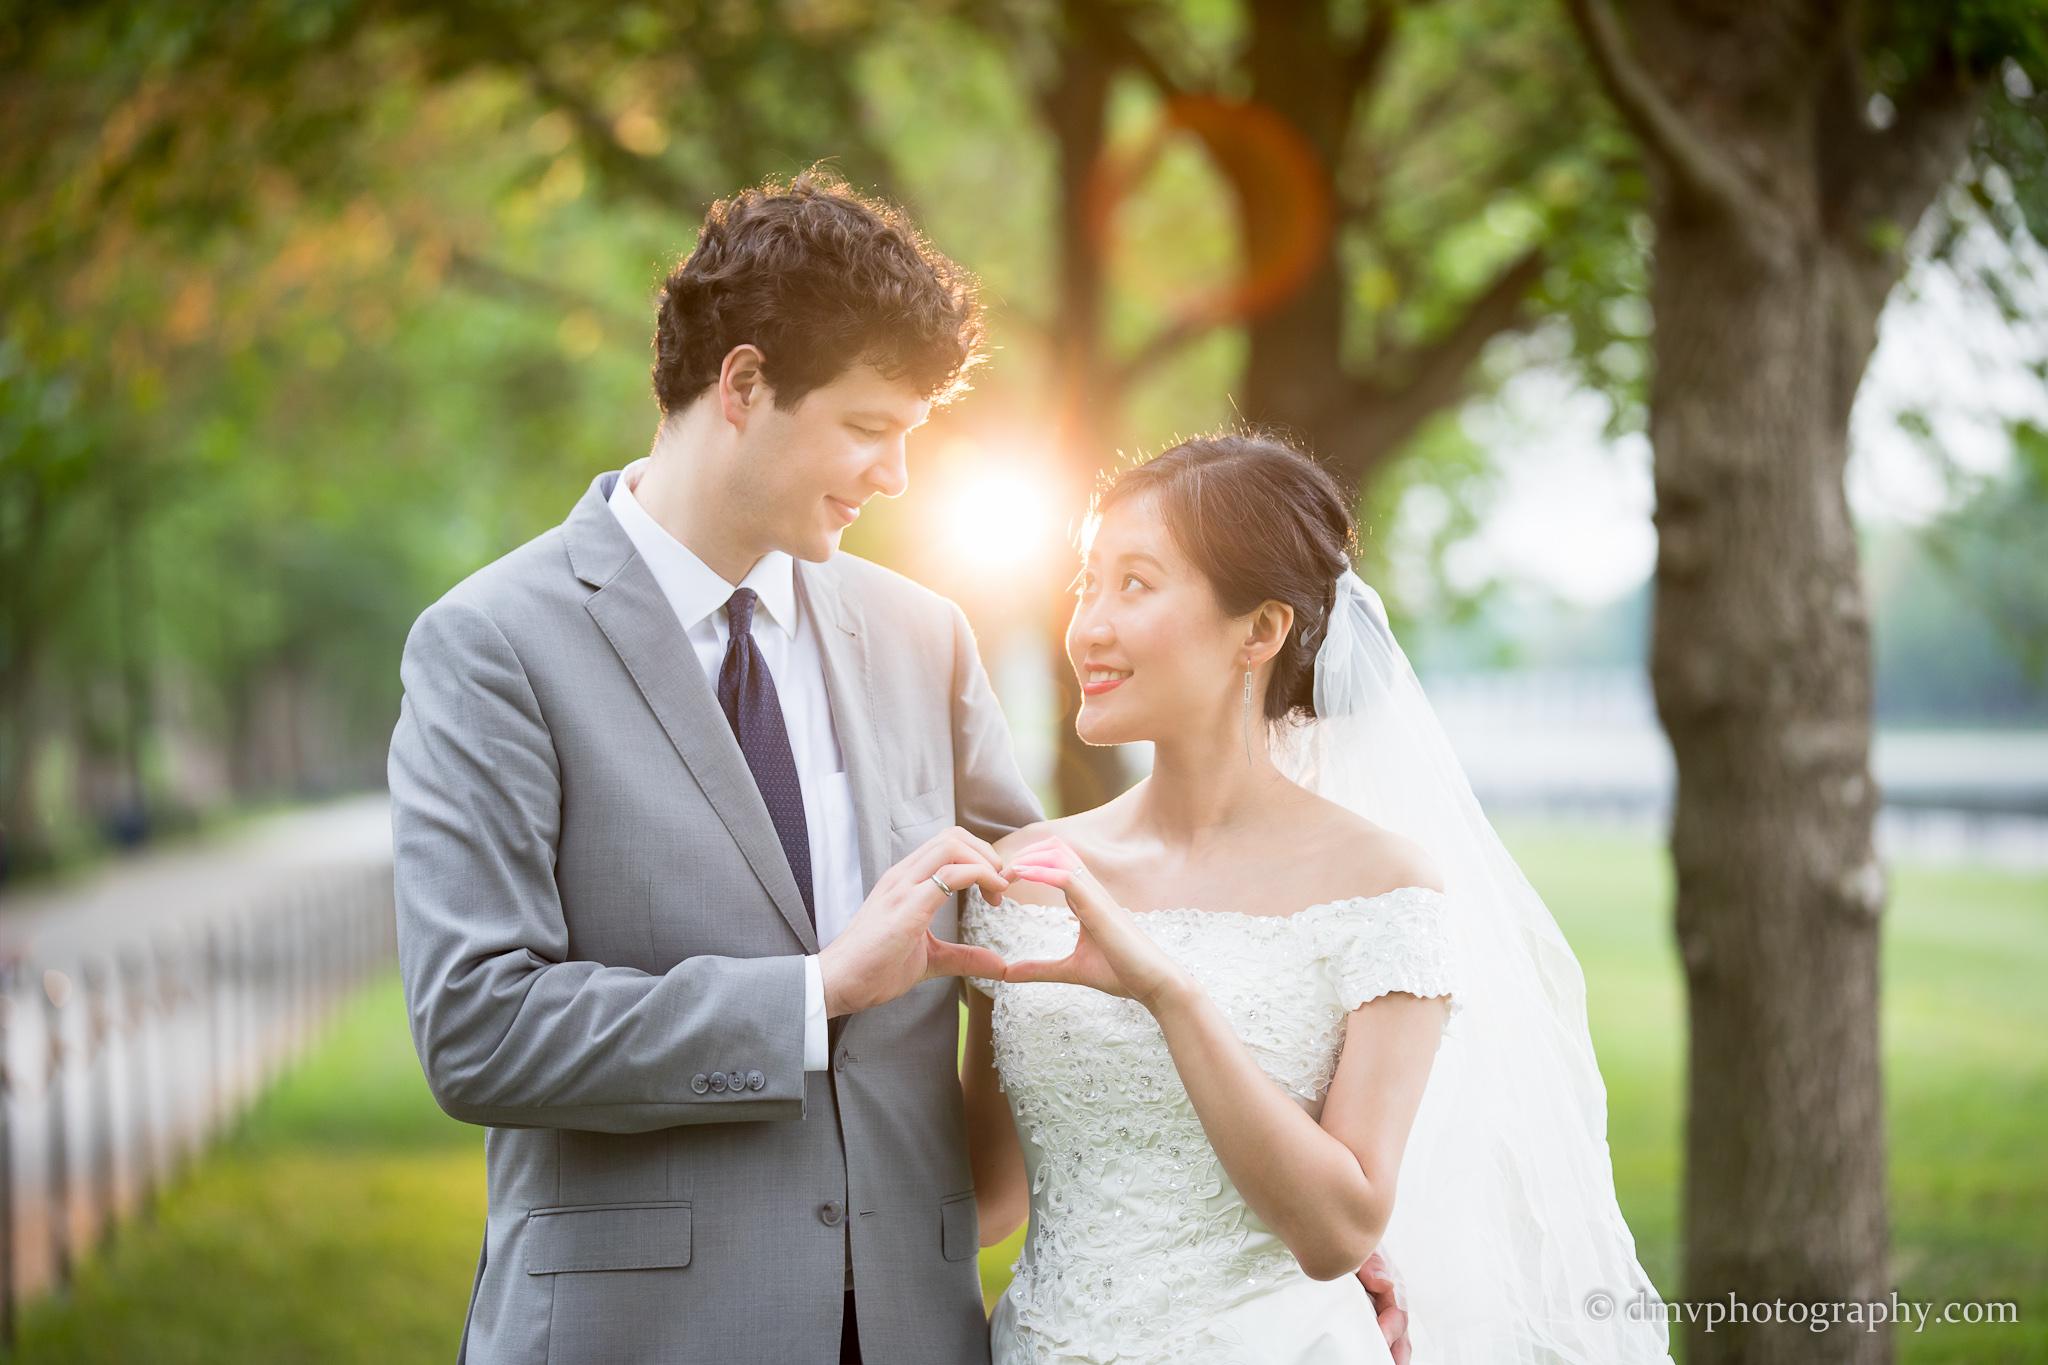 2017-04-30 - Wedding - 00199